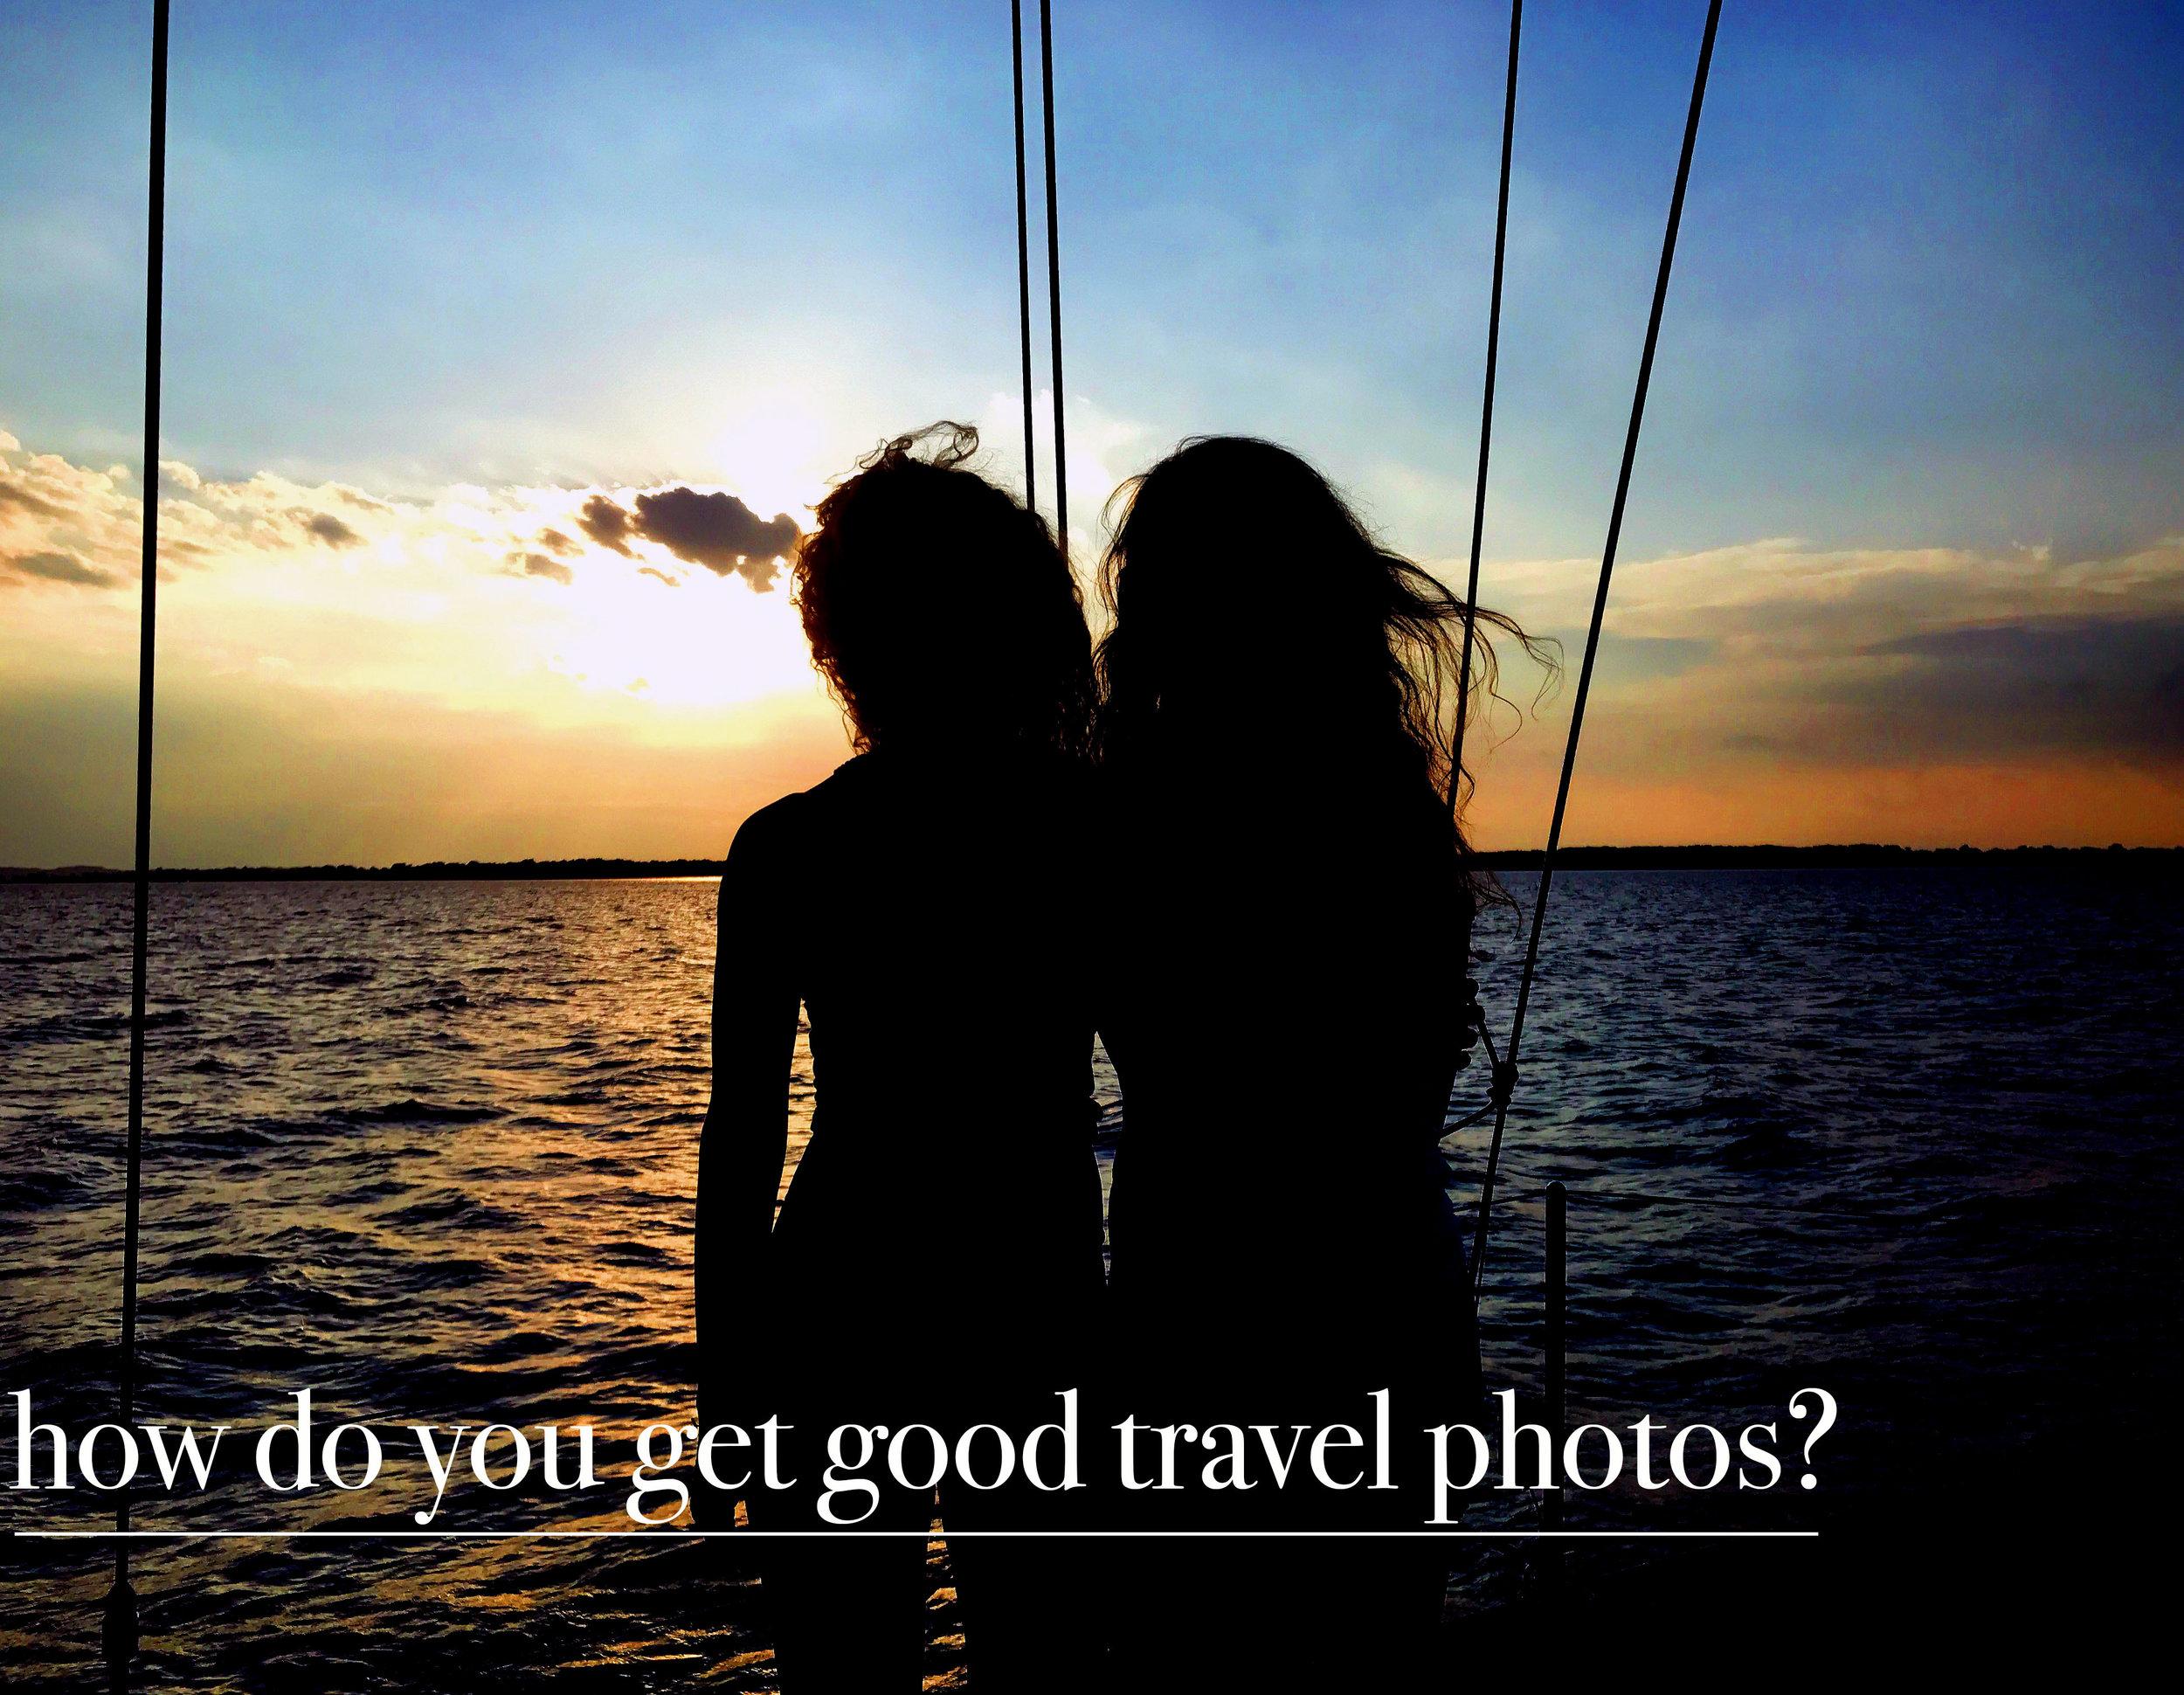 Travel Photo.jpg